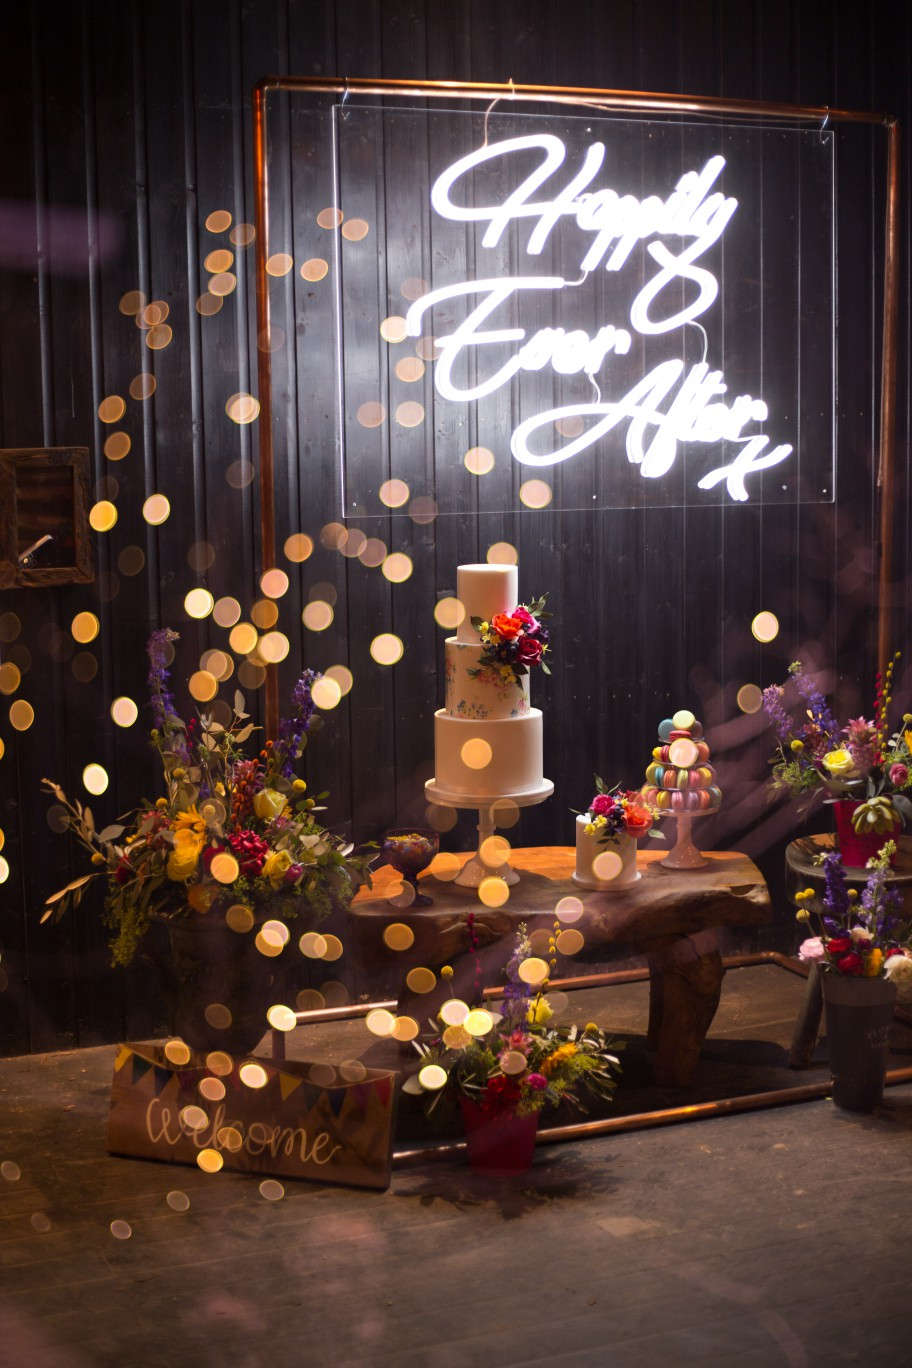 Becky Payne Photographer - Rainbow Unicorn Styled Wedding Shoot -Happily ever after - neon sign - wedding cake